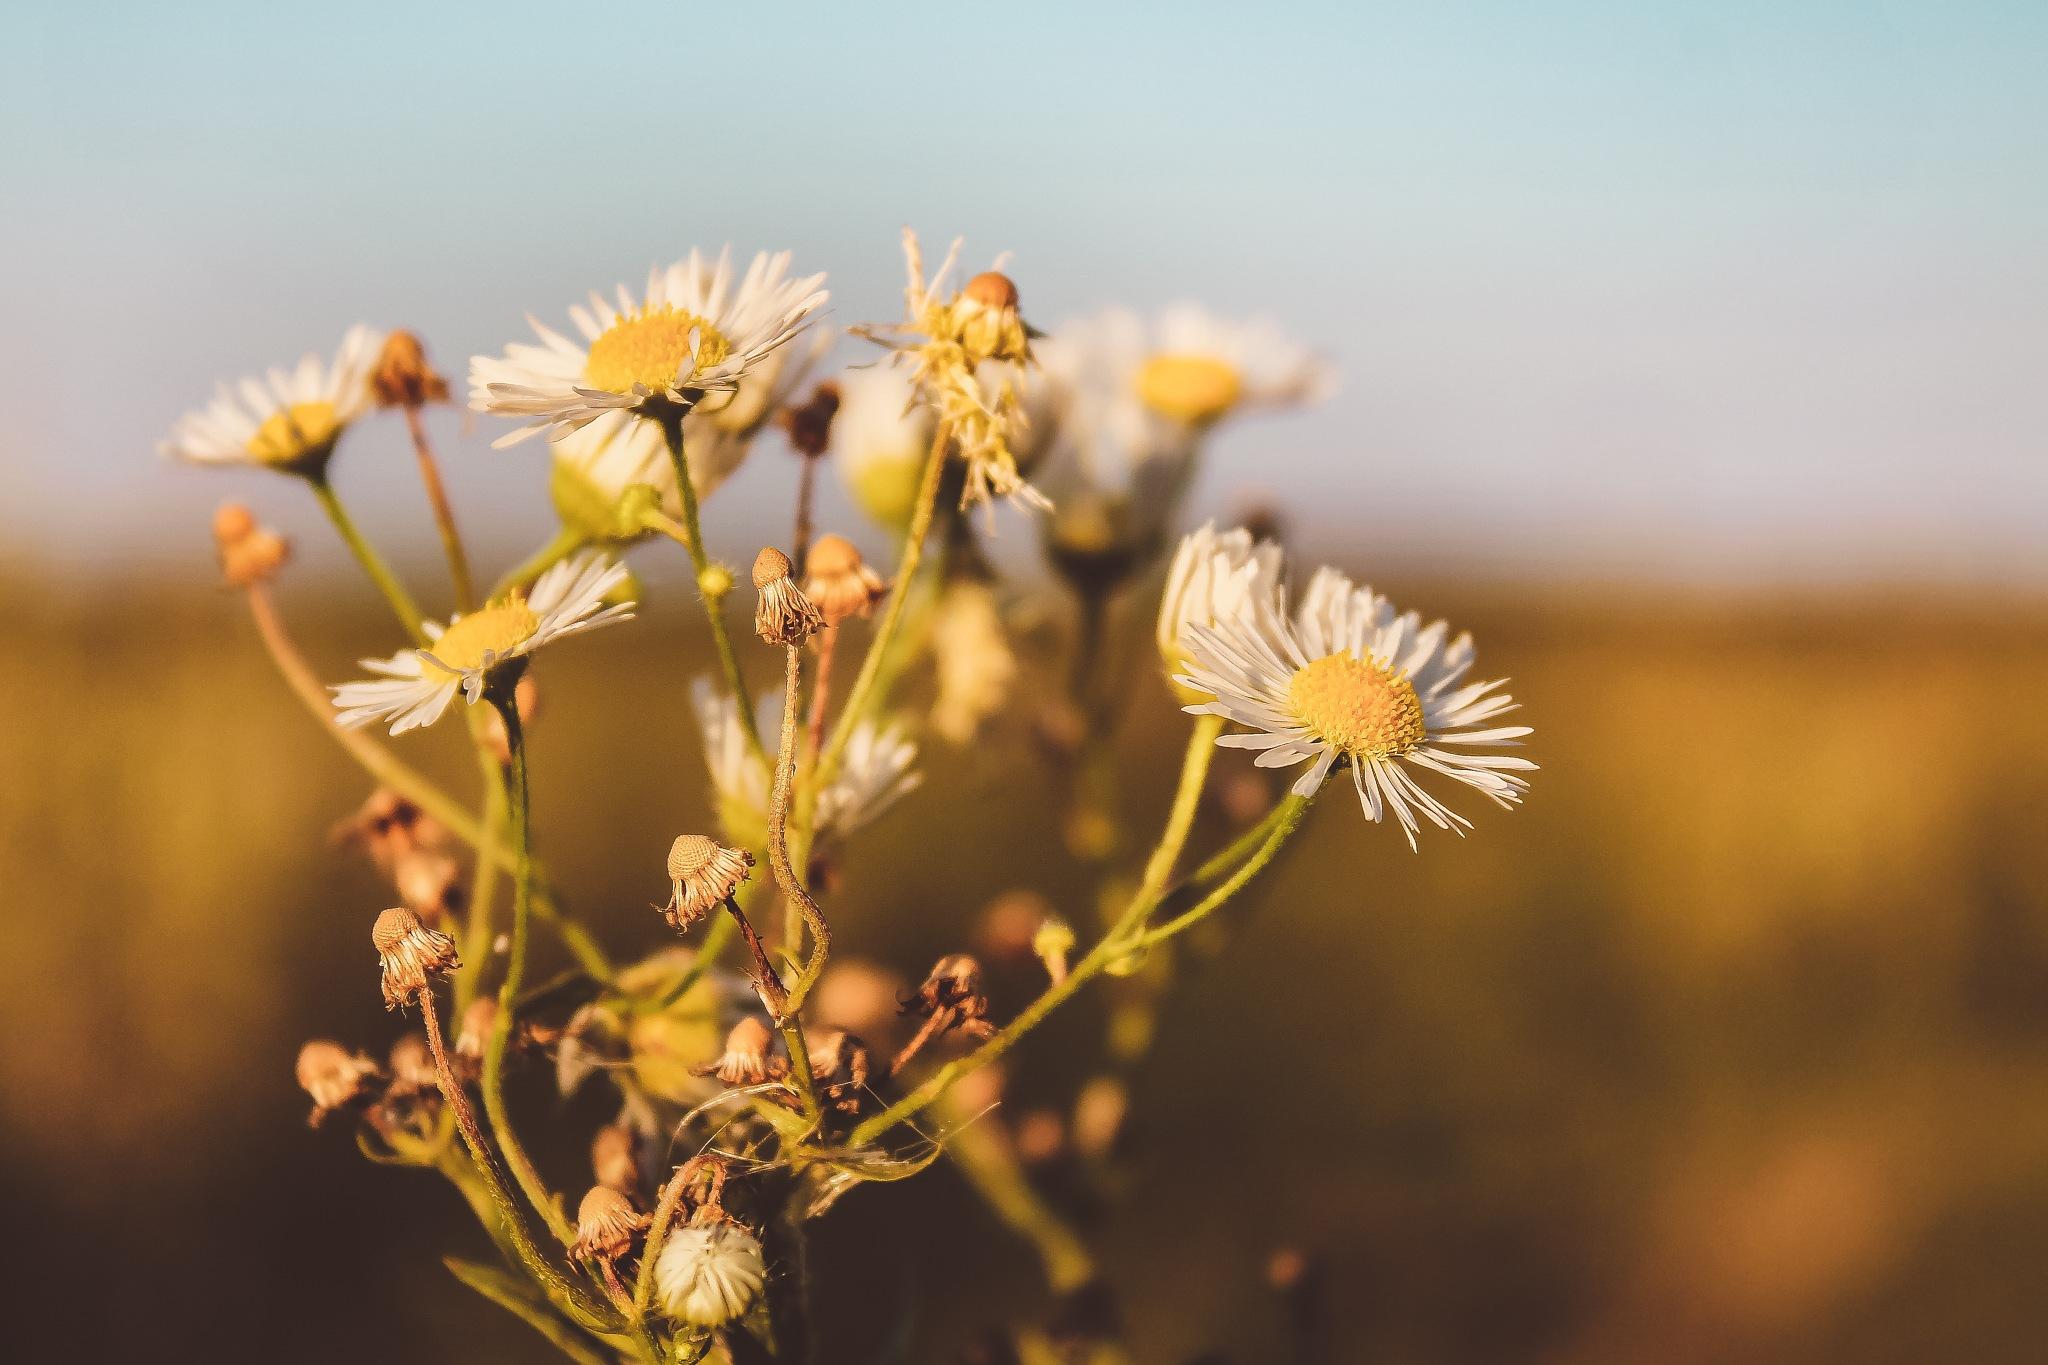 Flowers by Tamás Fóris